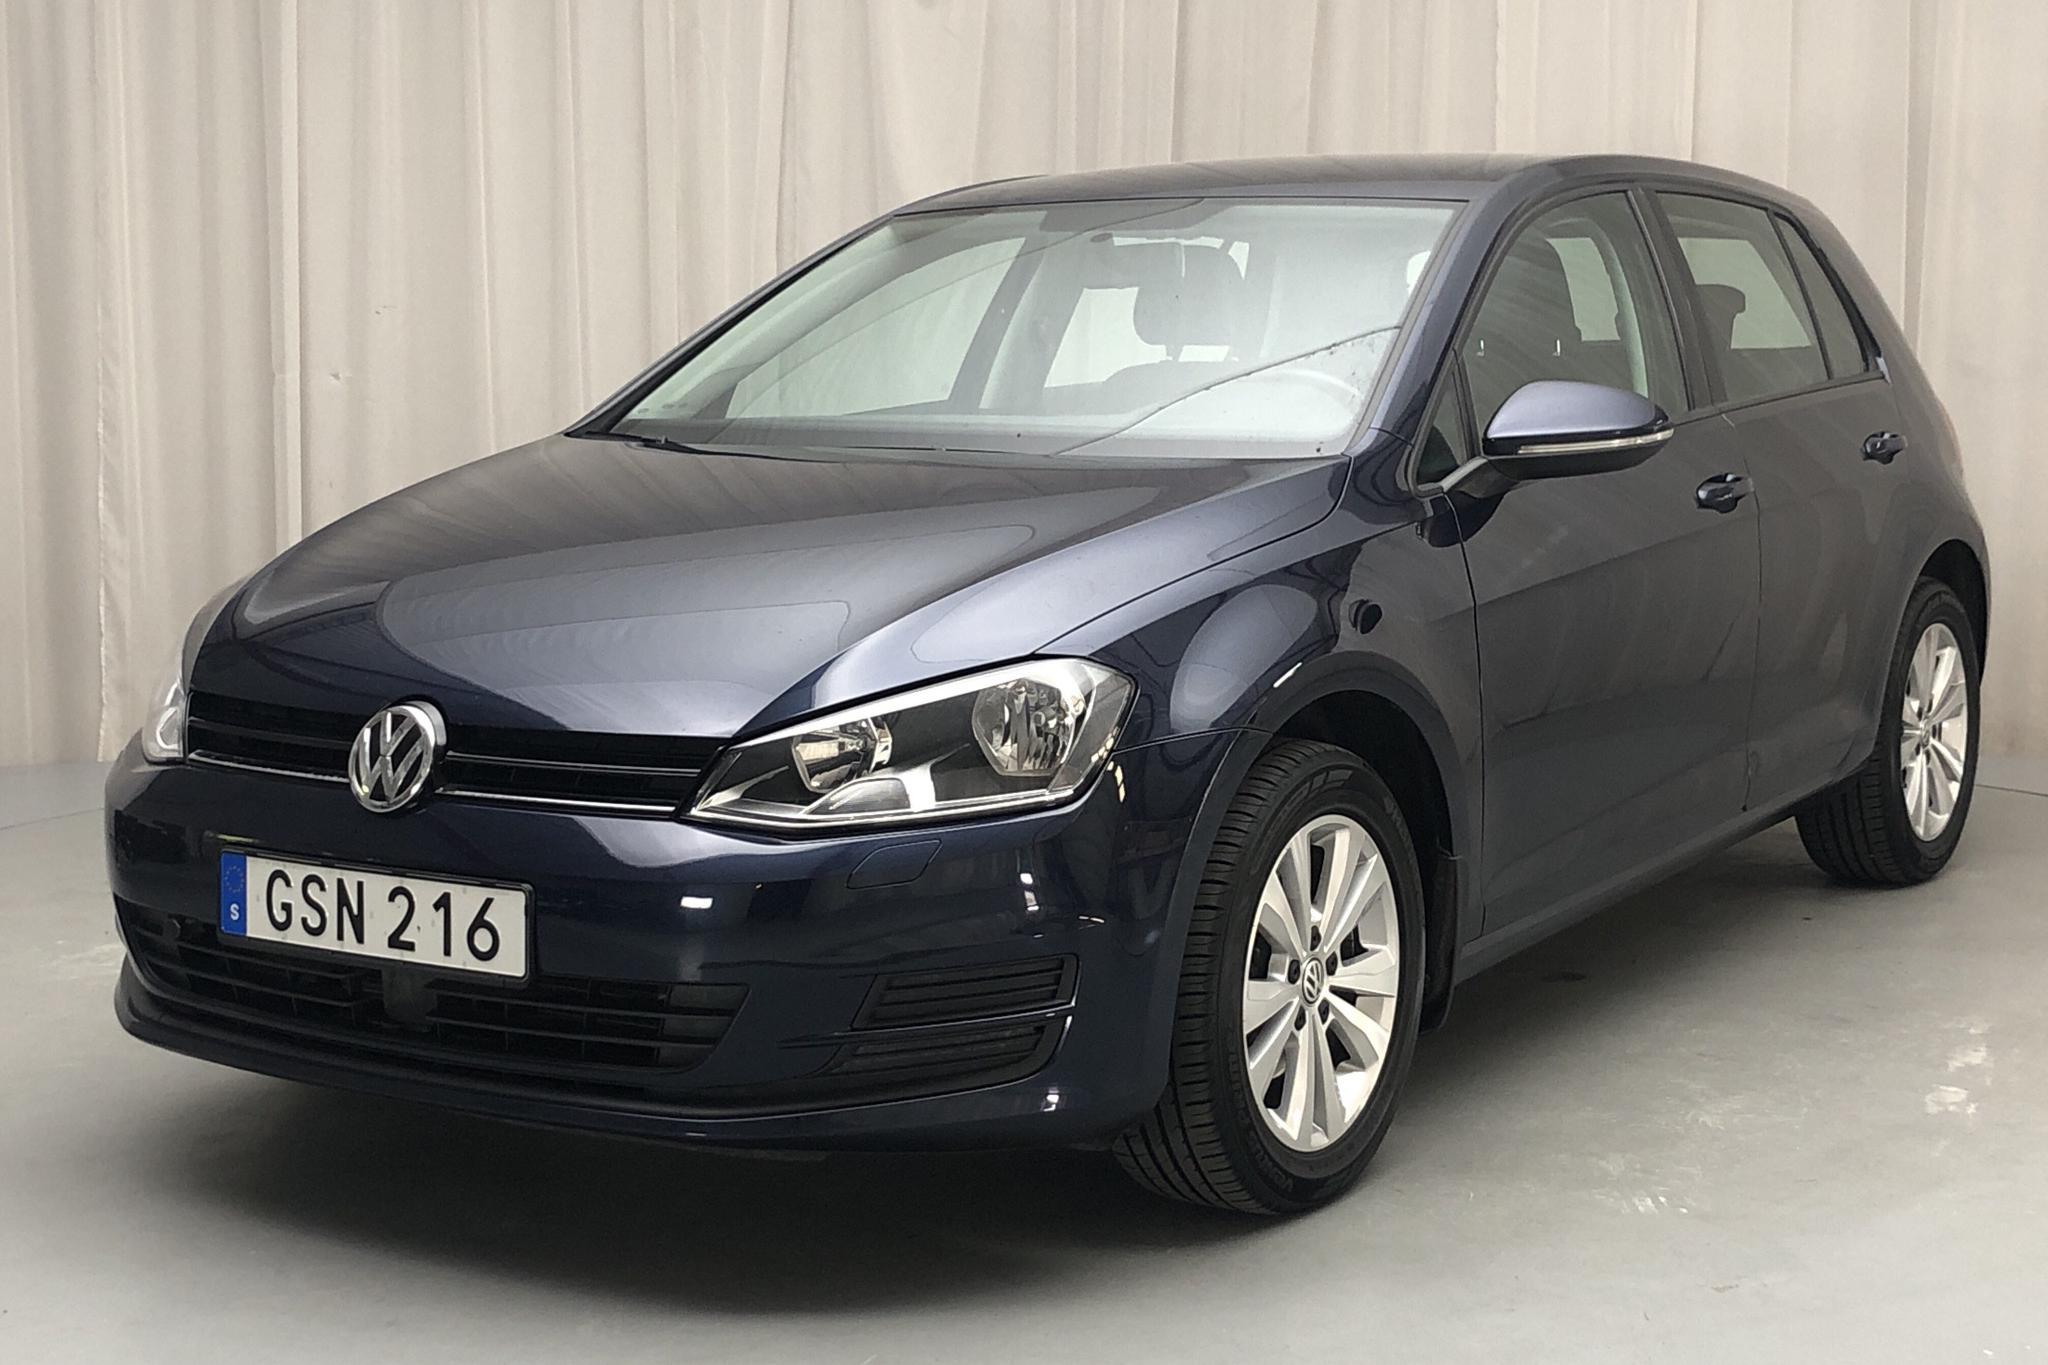 VW Golf VII 1.2 TSI 5dr (110hk) - 5 670 mil - Manuell - Dark Blue - 2016